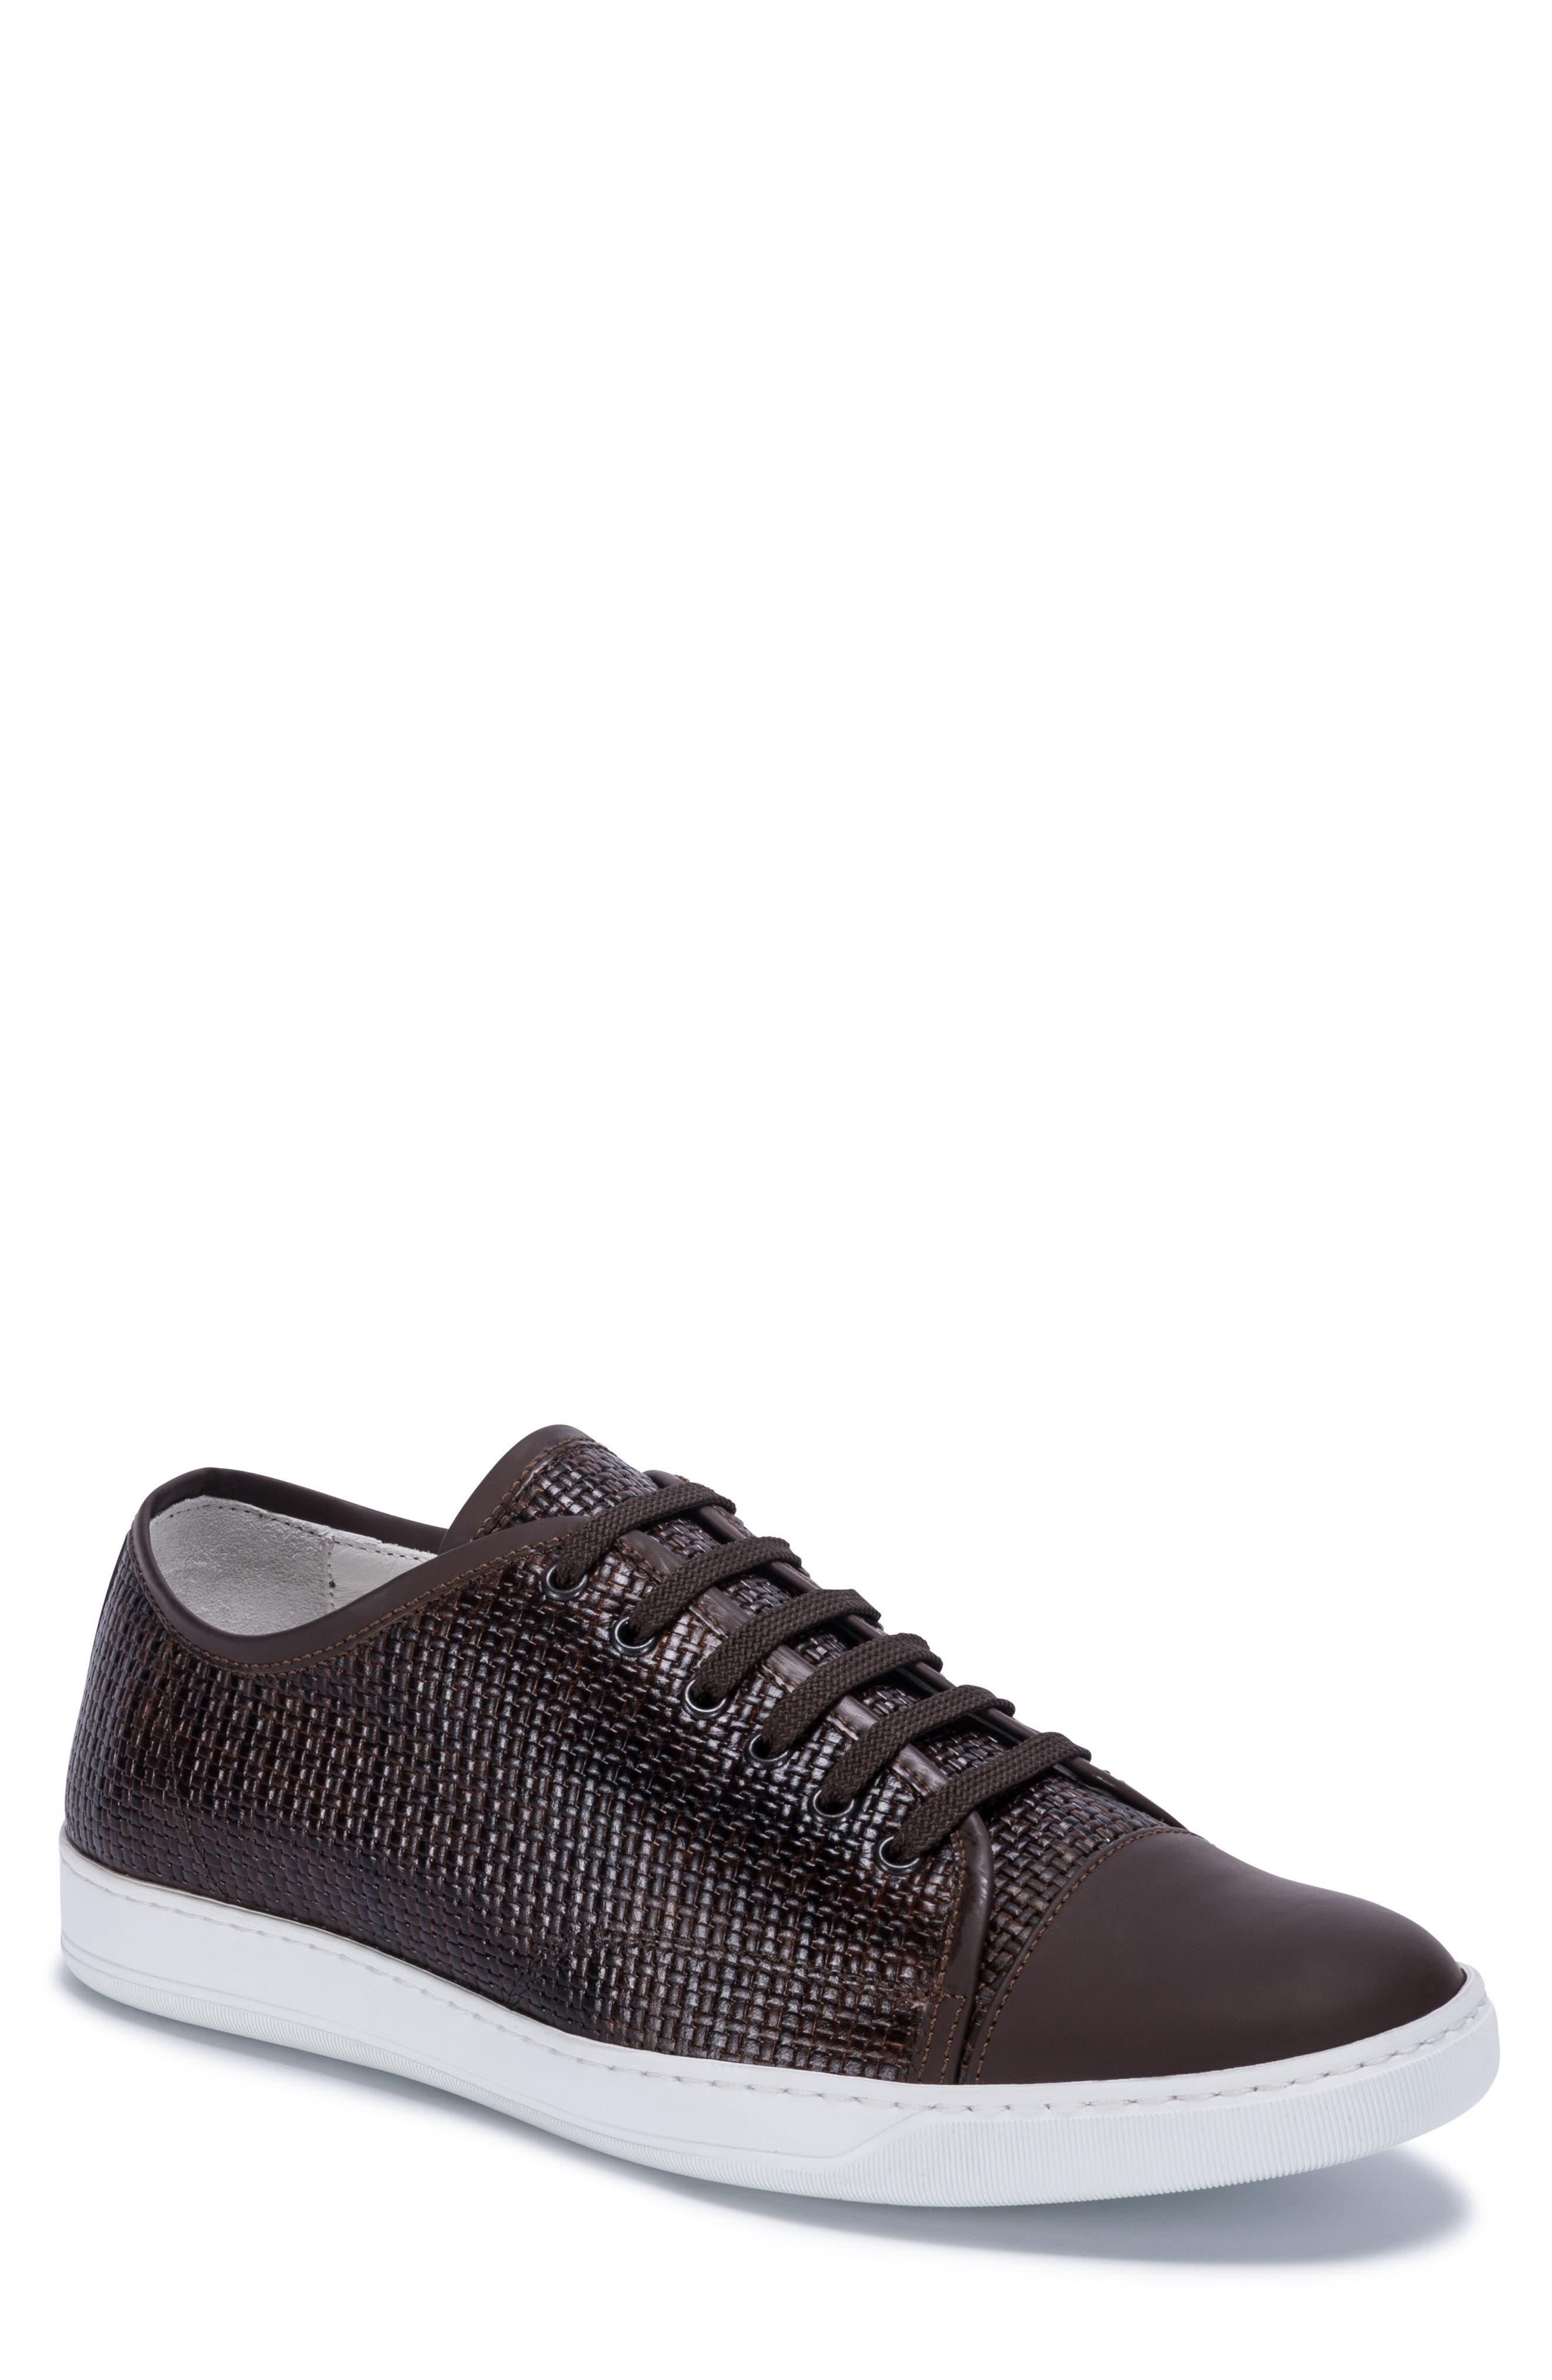 Cinque Terre Woven Cap Toe Sneaker,                         Main,                         color, Brown Leather